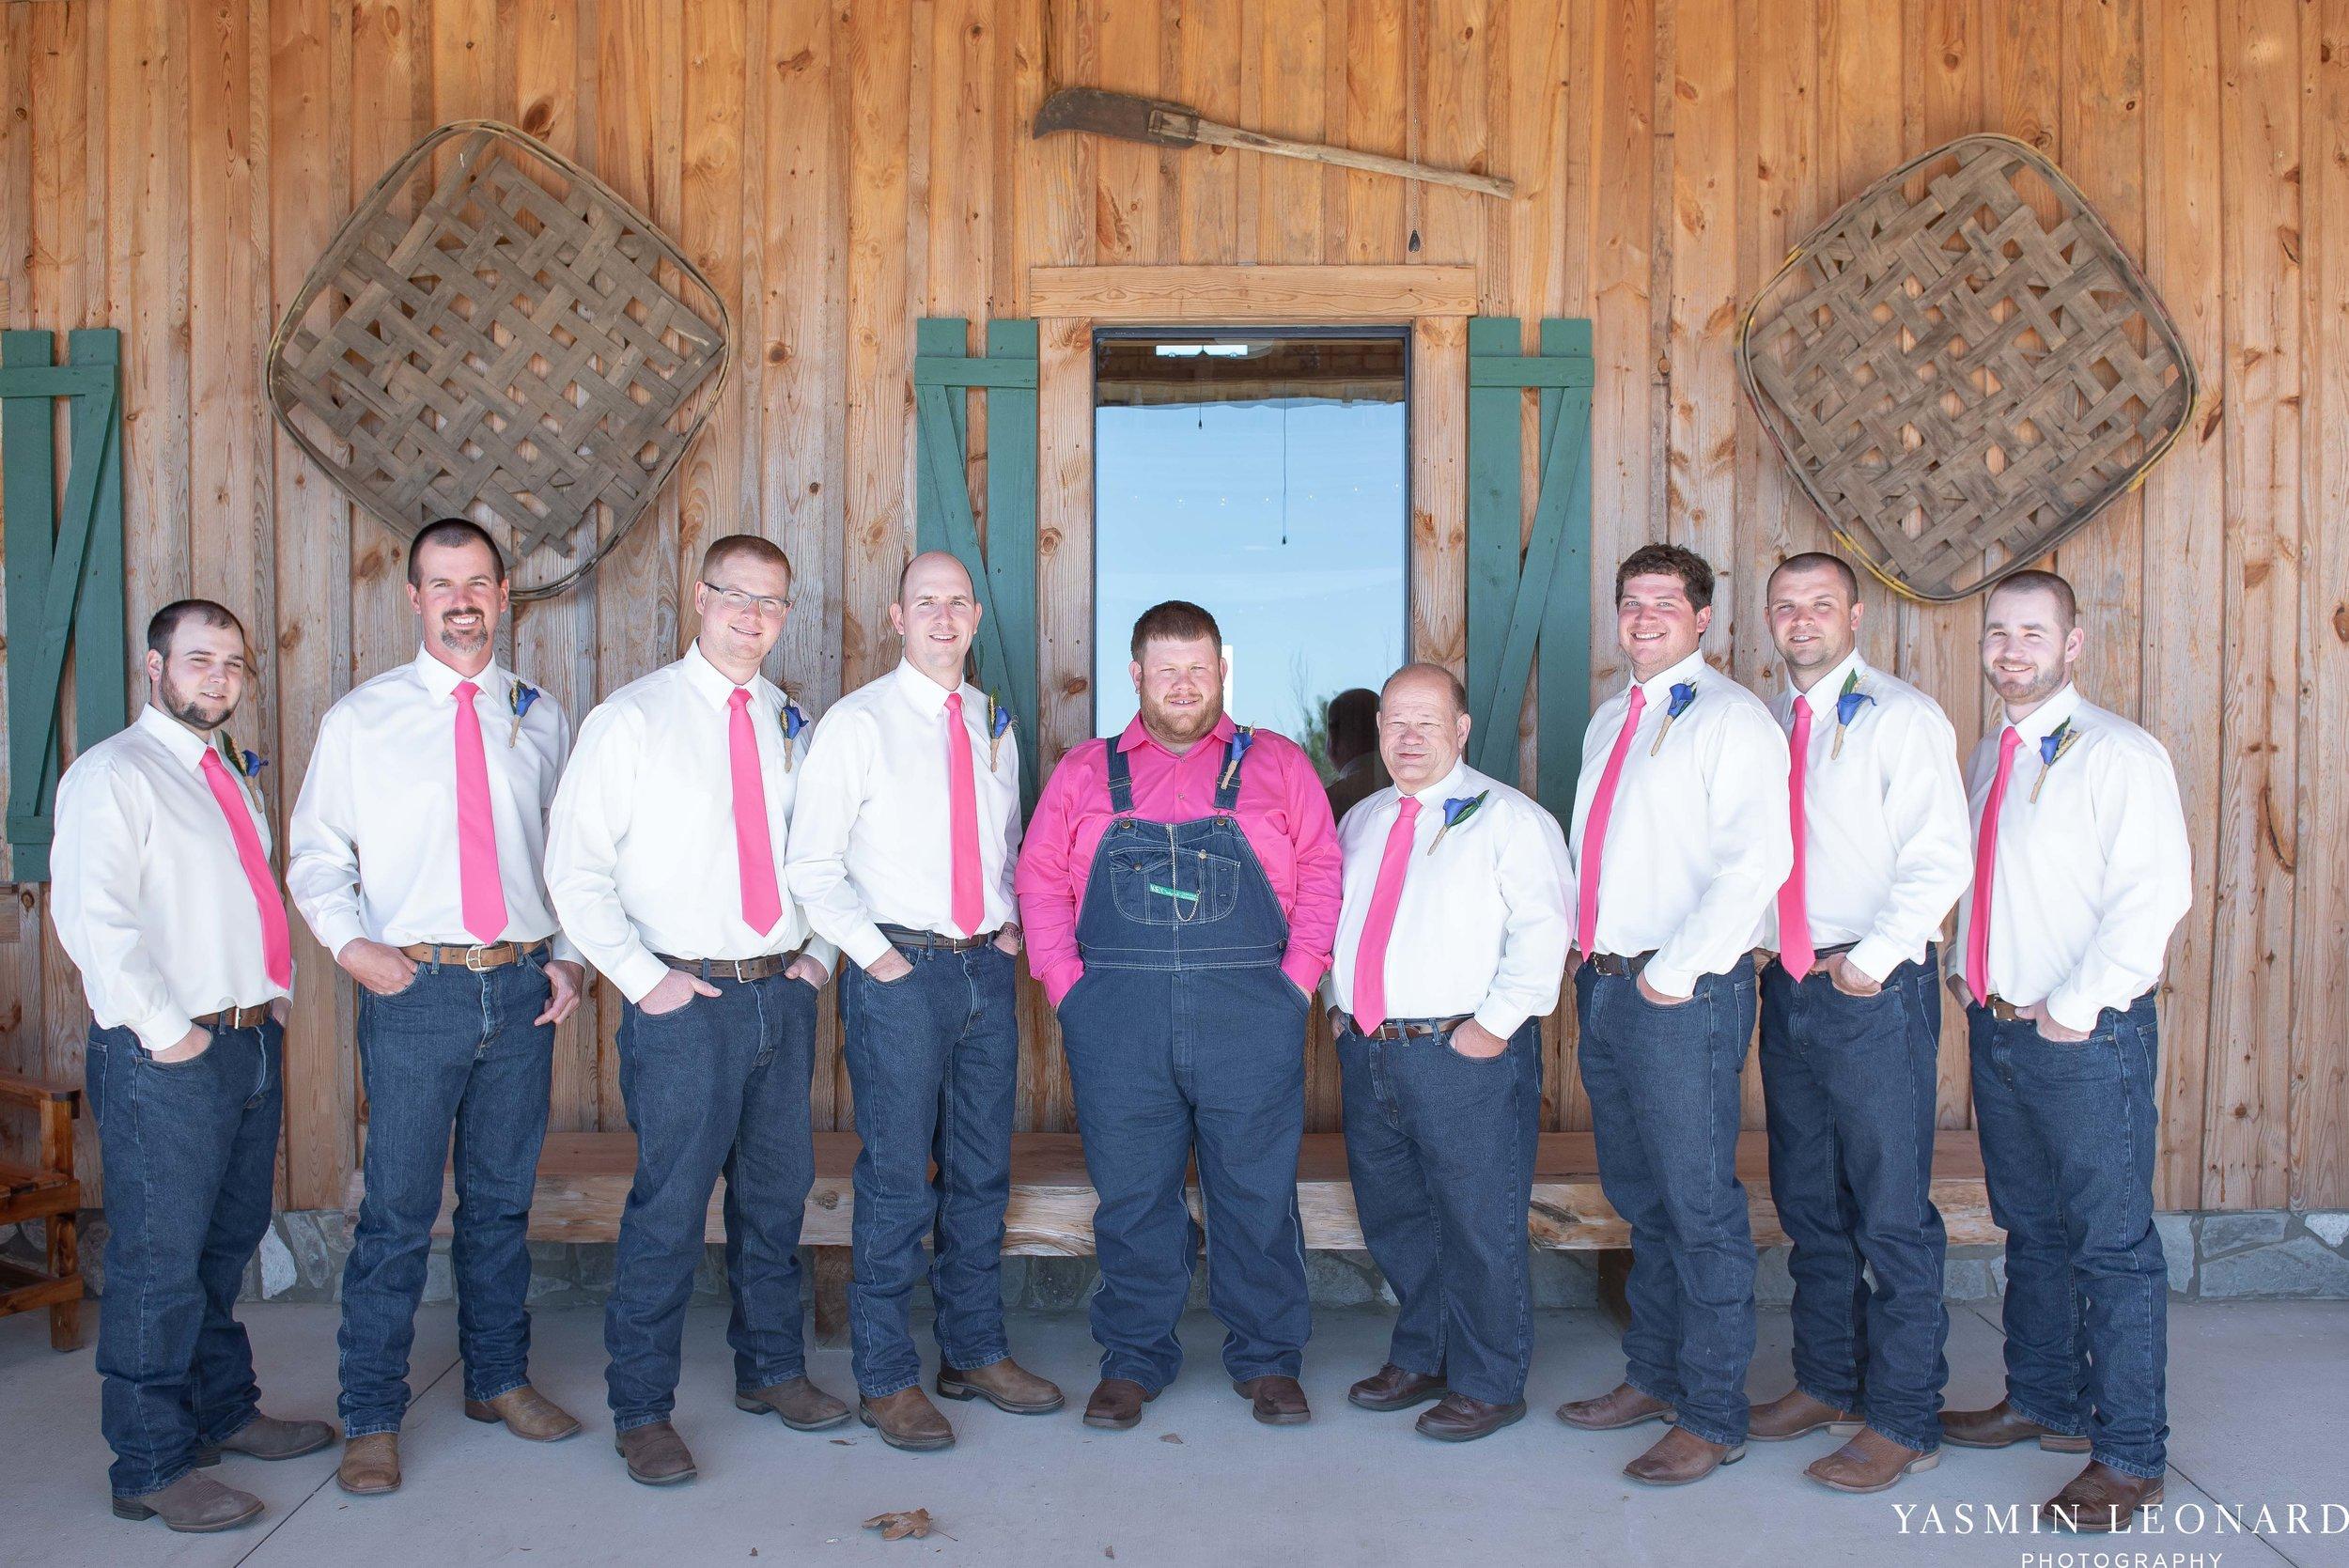 The Barn at Heritage Farm - Country Wedding - Pink and Blue Wedding - Barn Wedding - Outdoor Wedding - Cotton and Wheat Decor - Groom in Bibs - Pink Bridal Colors - Yasmin Leonard Photography-9.jpg